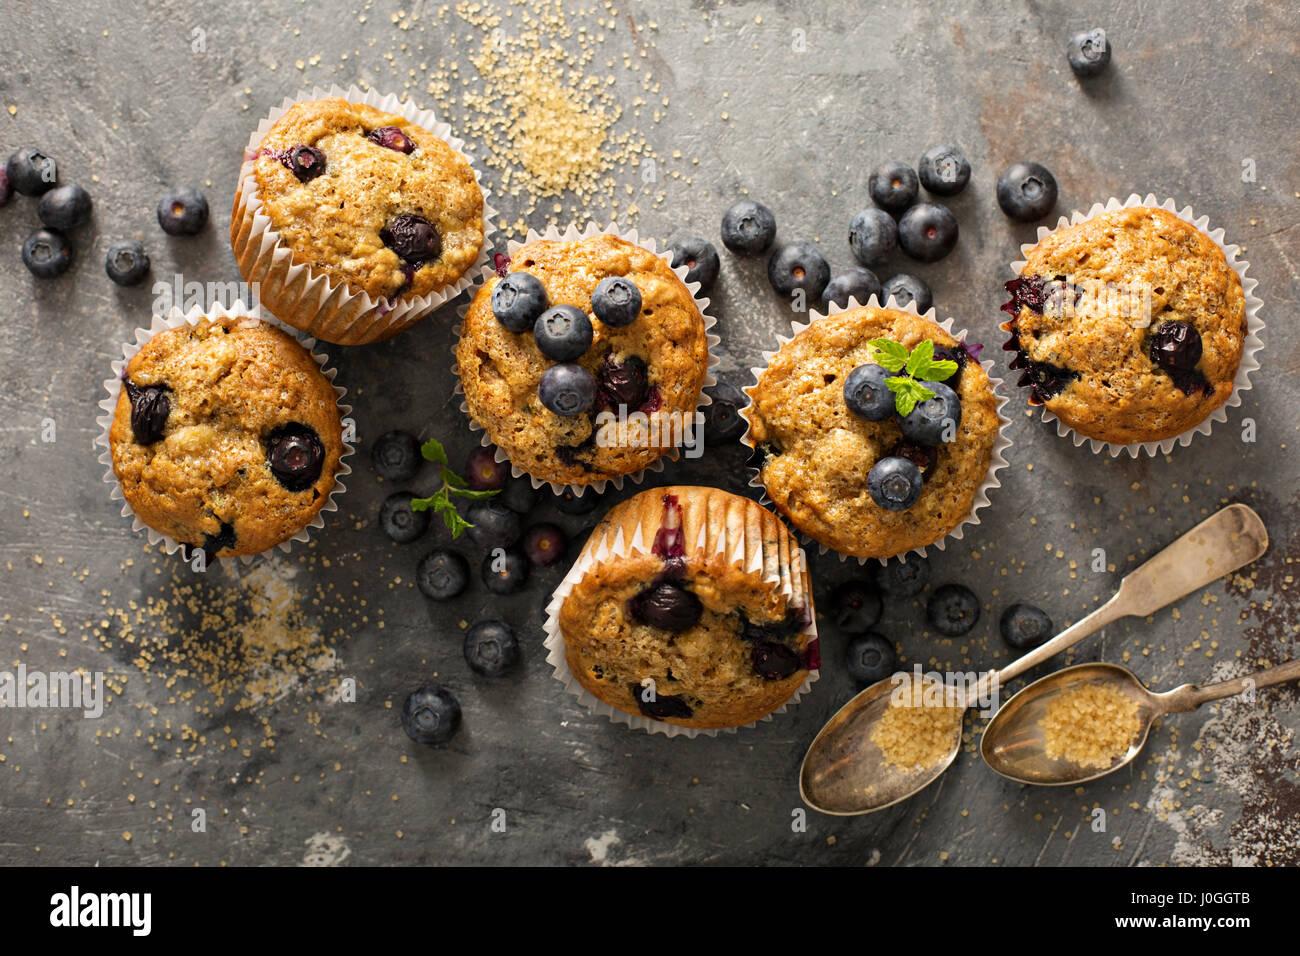 Vegan banana blueberry muffins - Stock Image